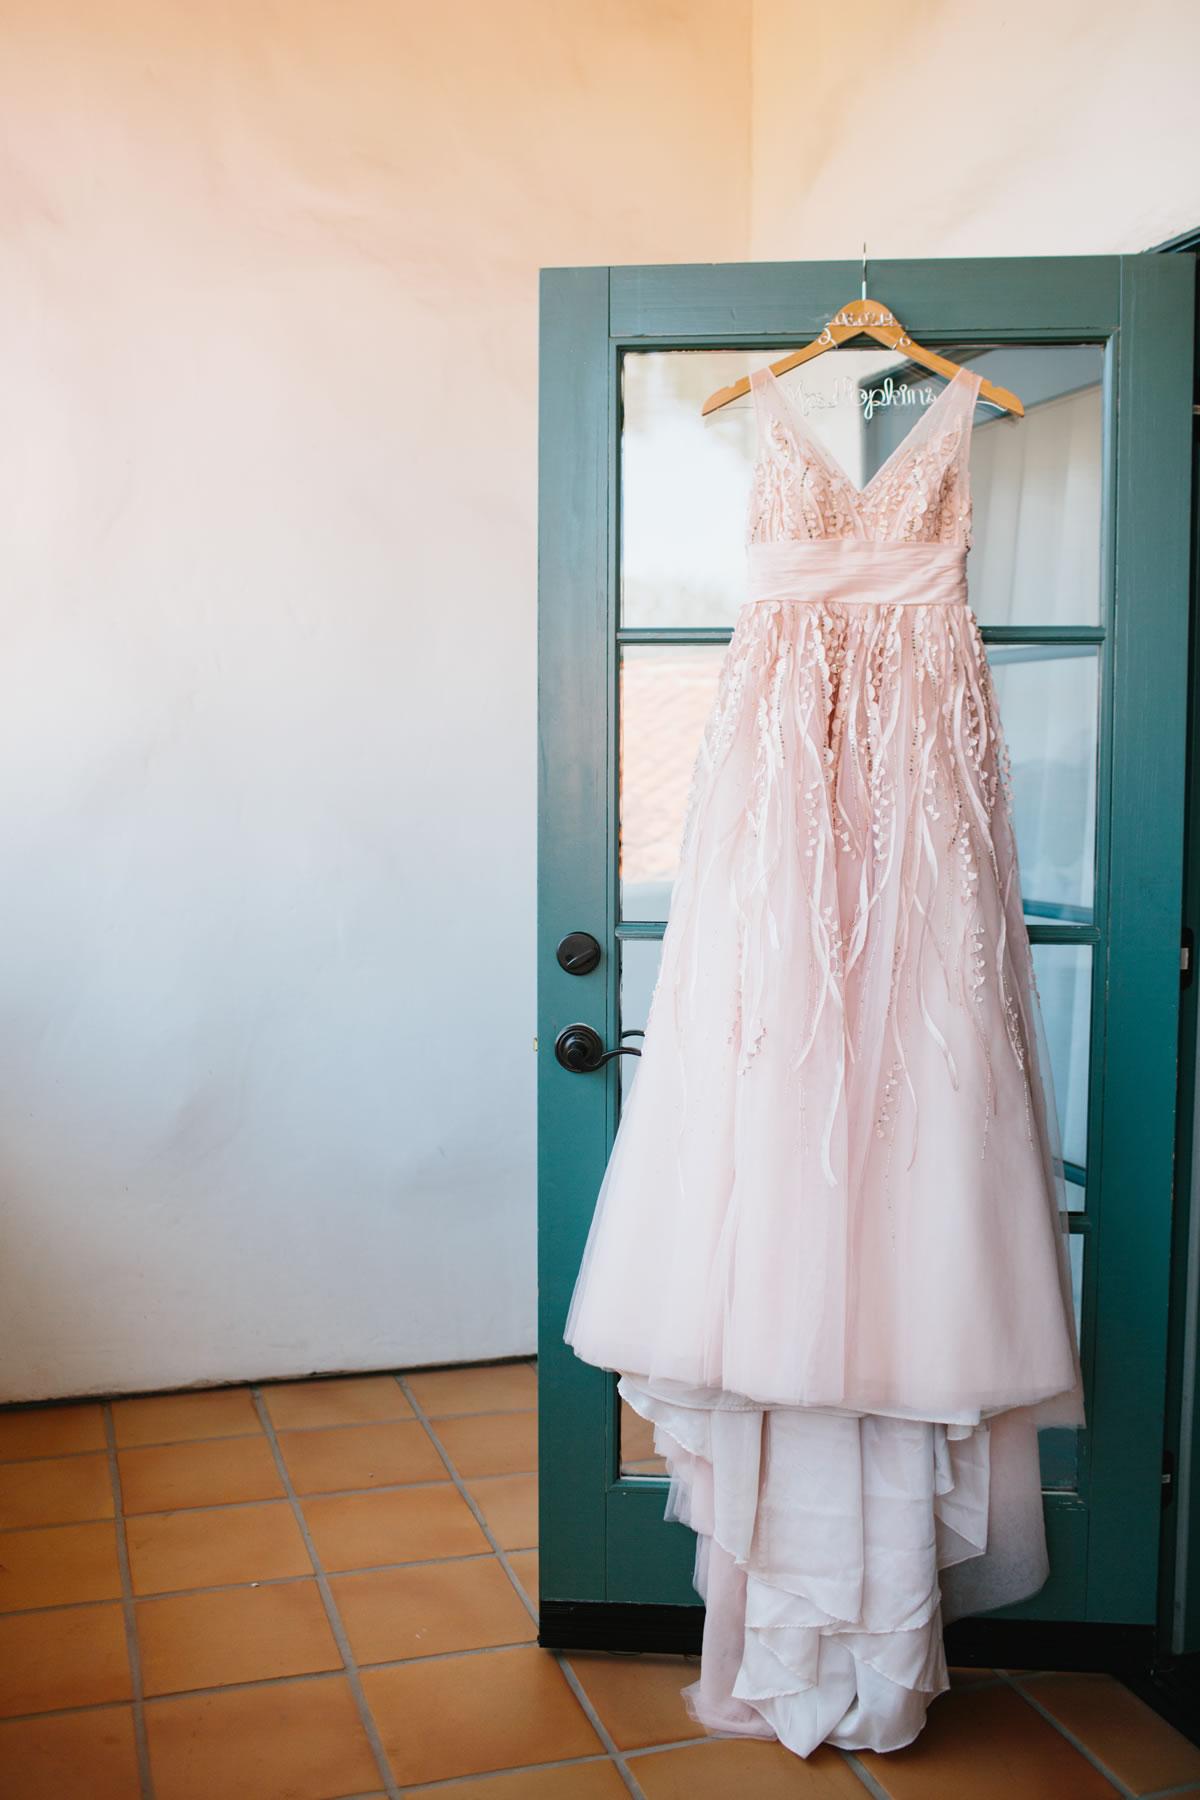 XOXO-BRIDE-Marianne-Wilson-Photography-JD-Details-020-3351718246-O